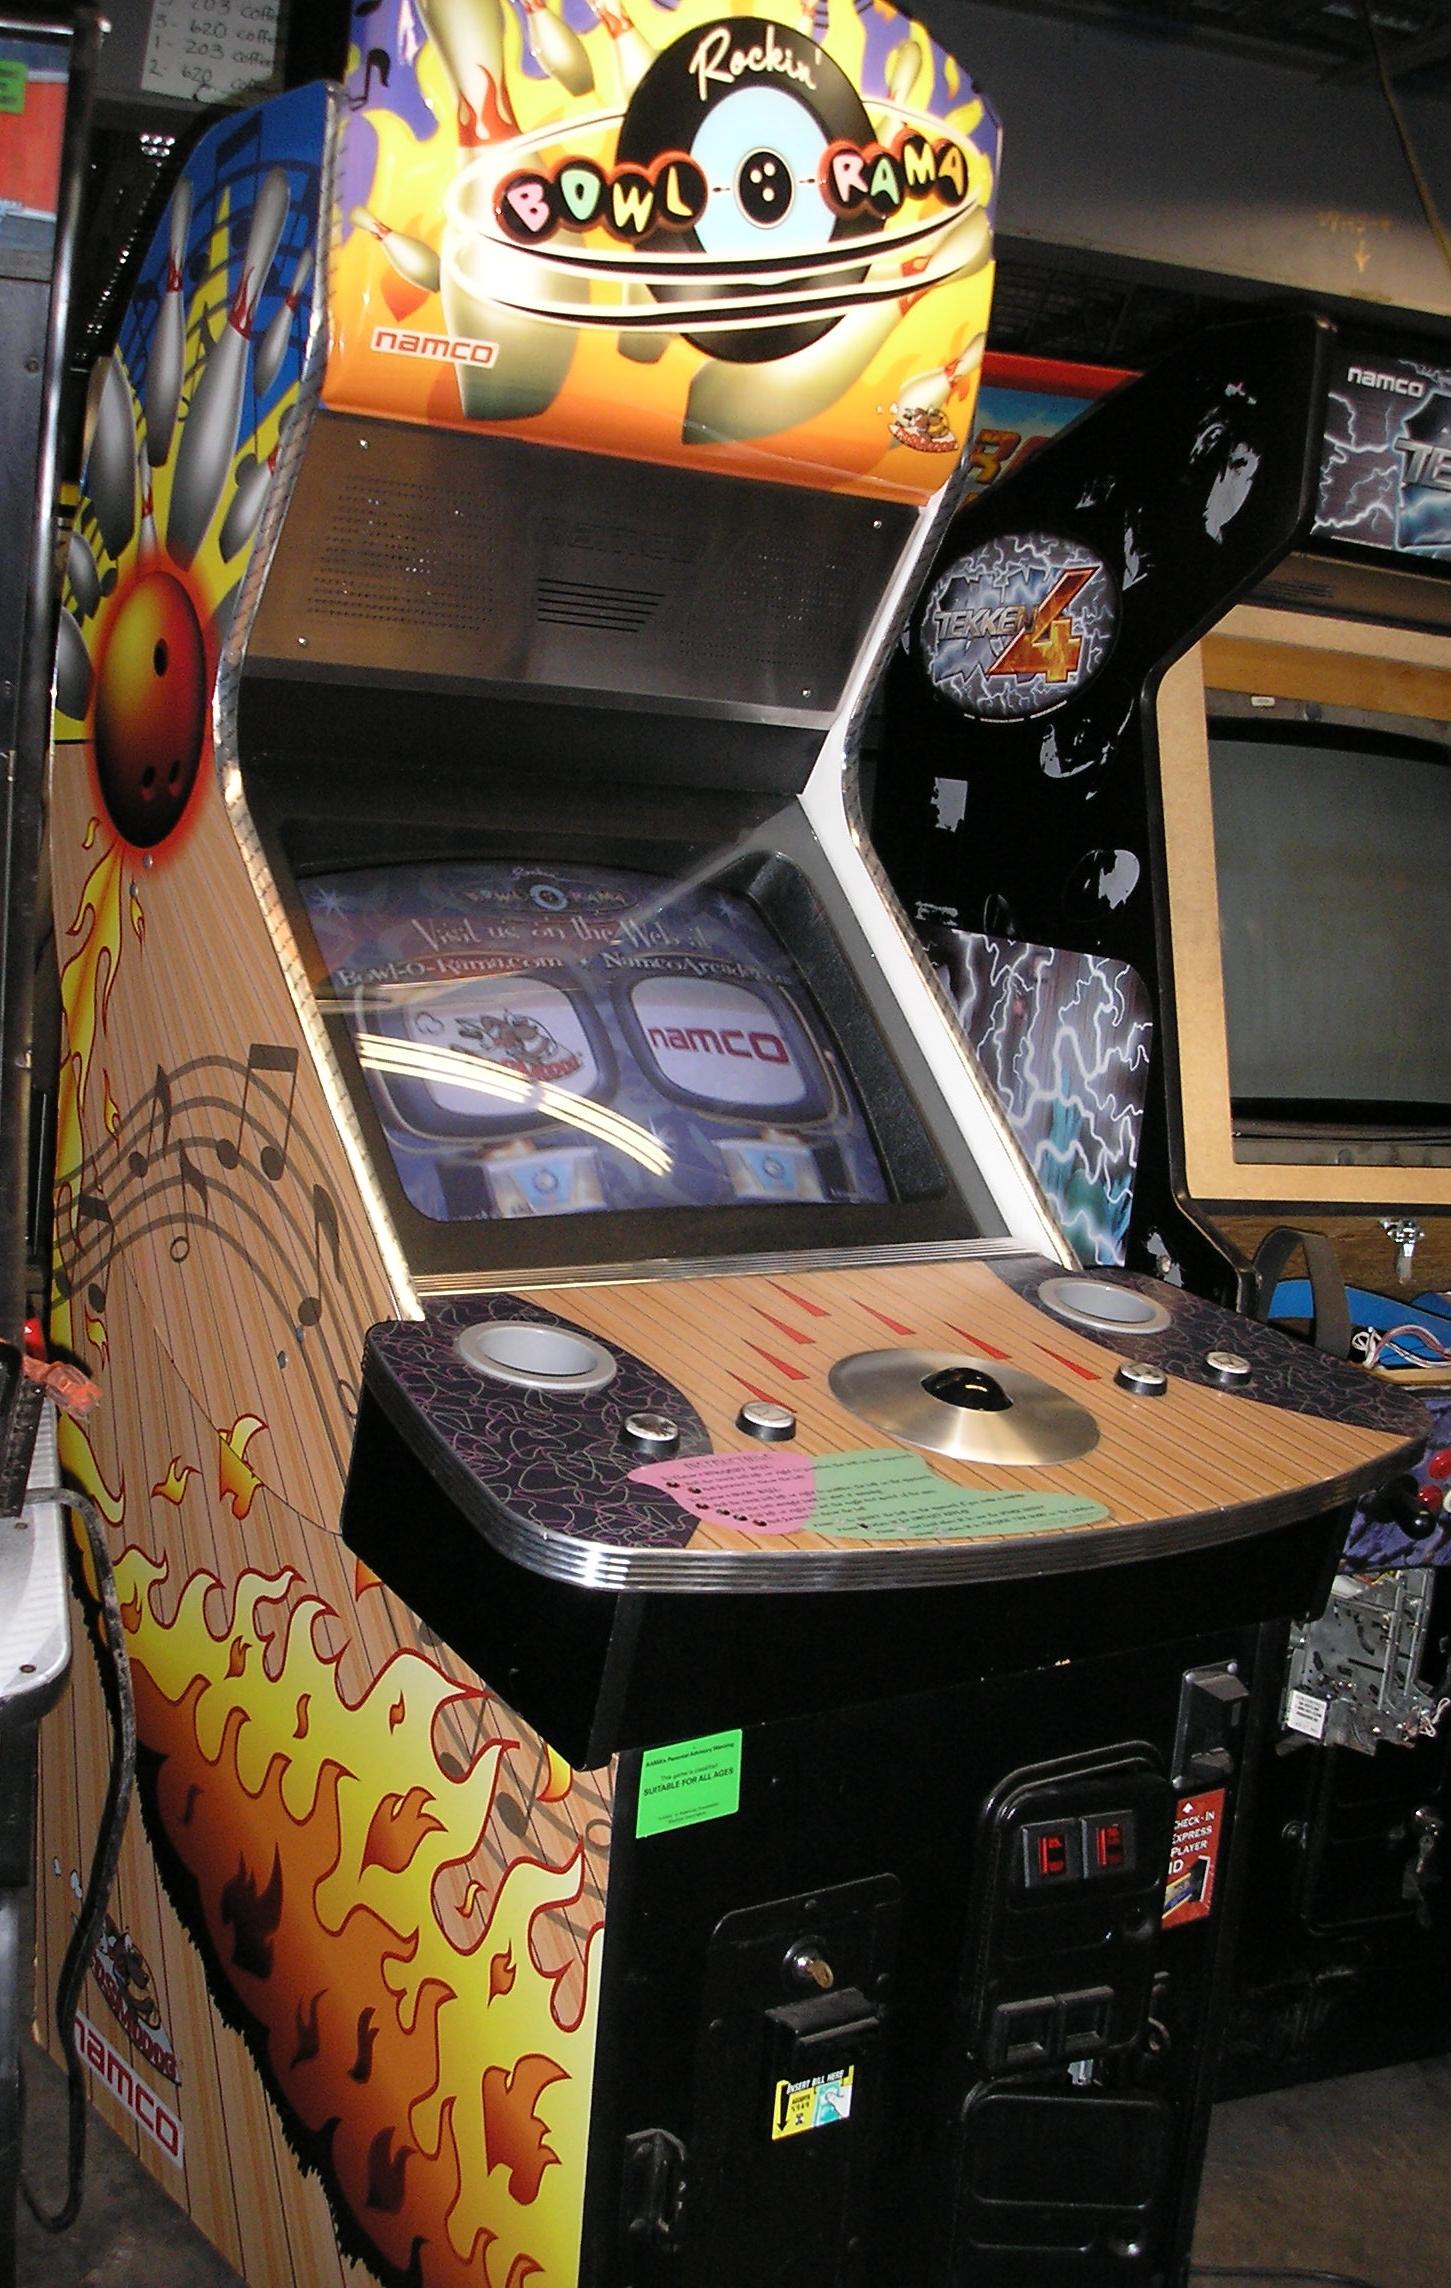 Rockin Bowl O Rama Arcade Machine Game For Sale By Namco